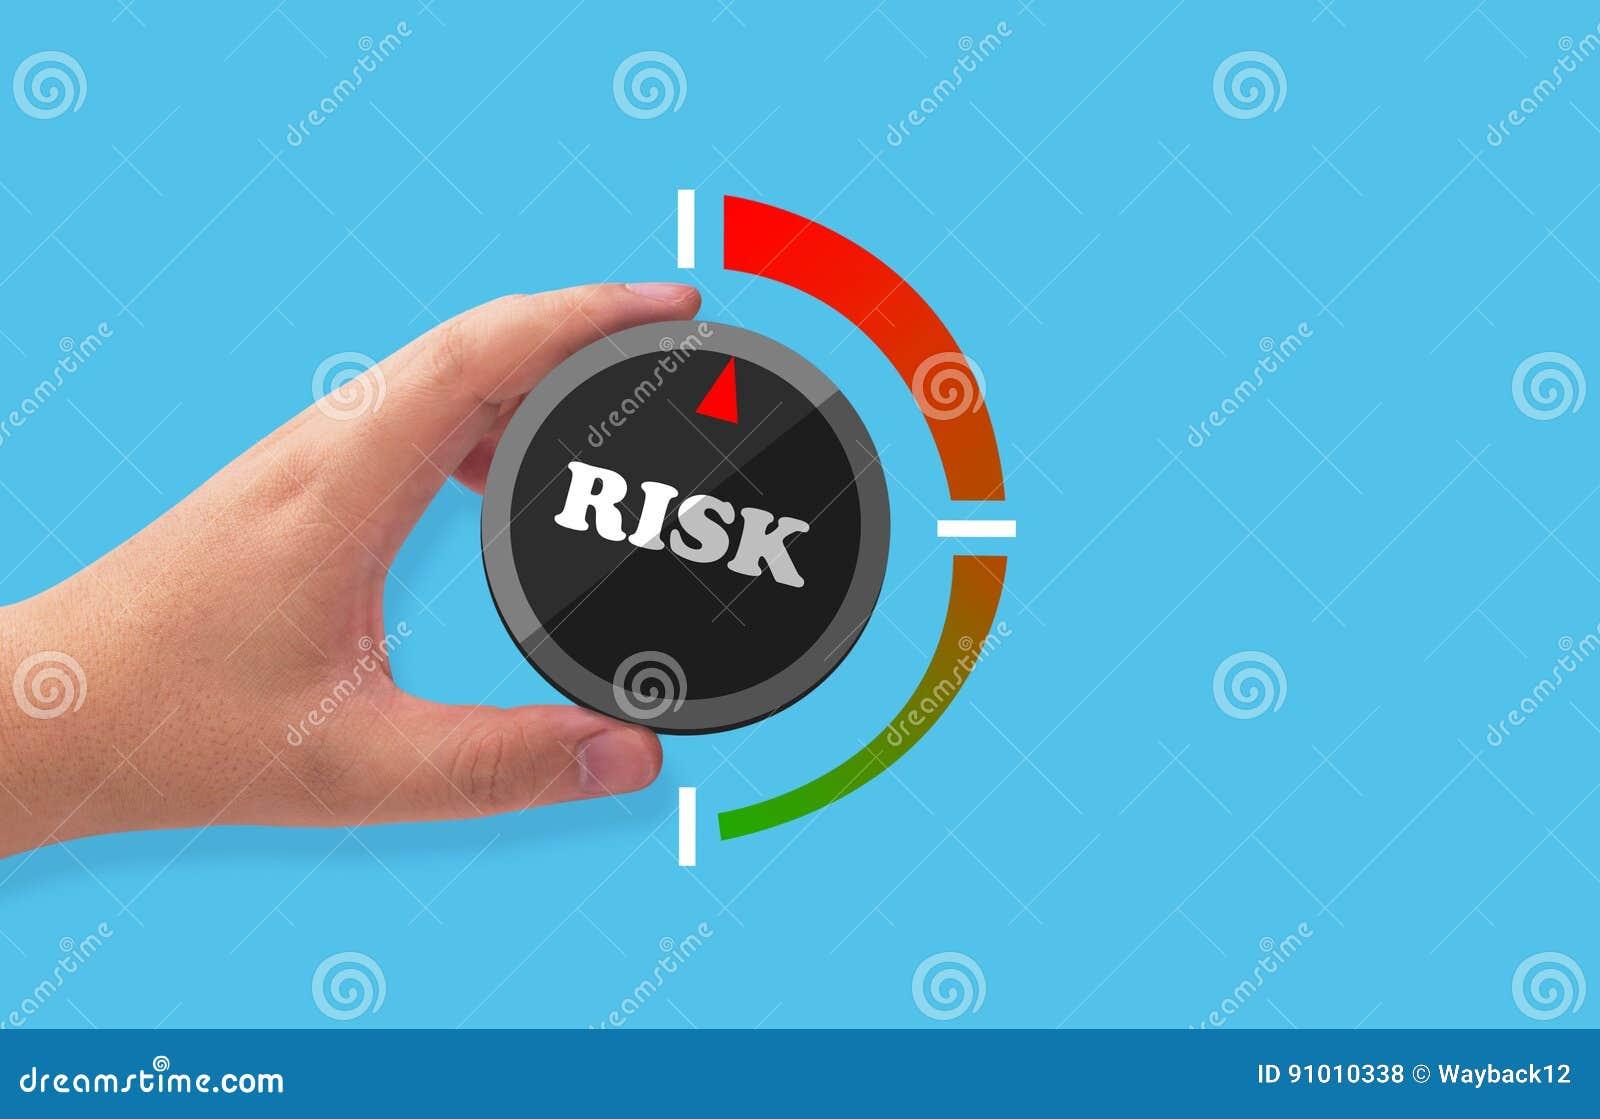 Оценка степени риска, концепция управления